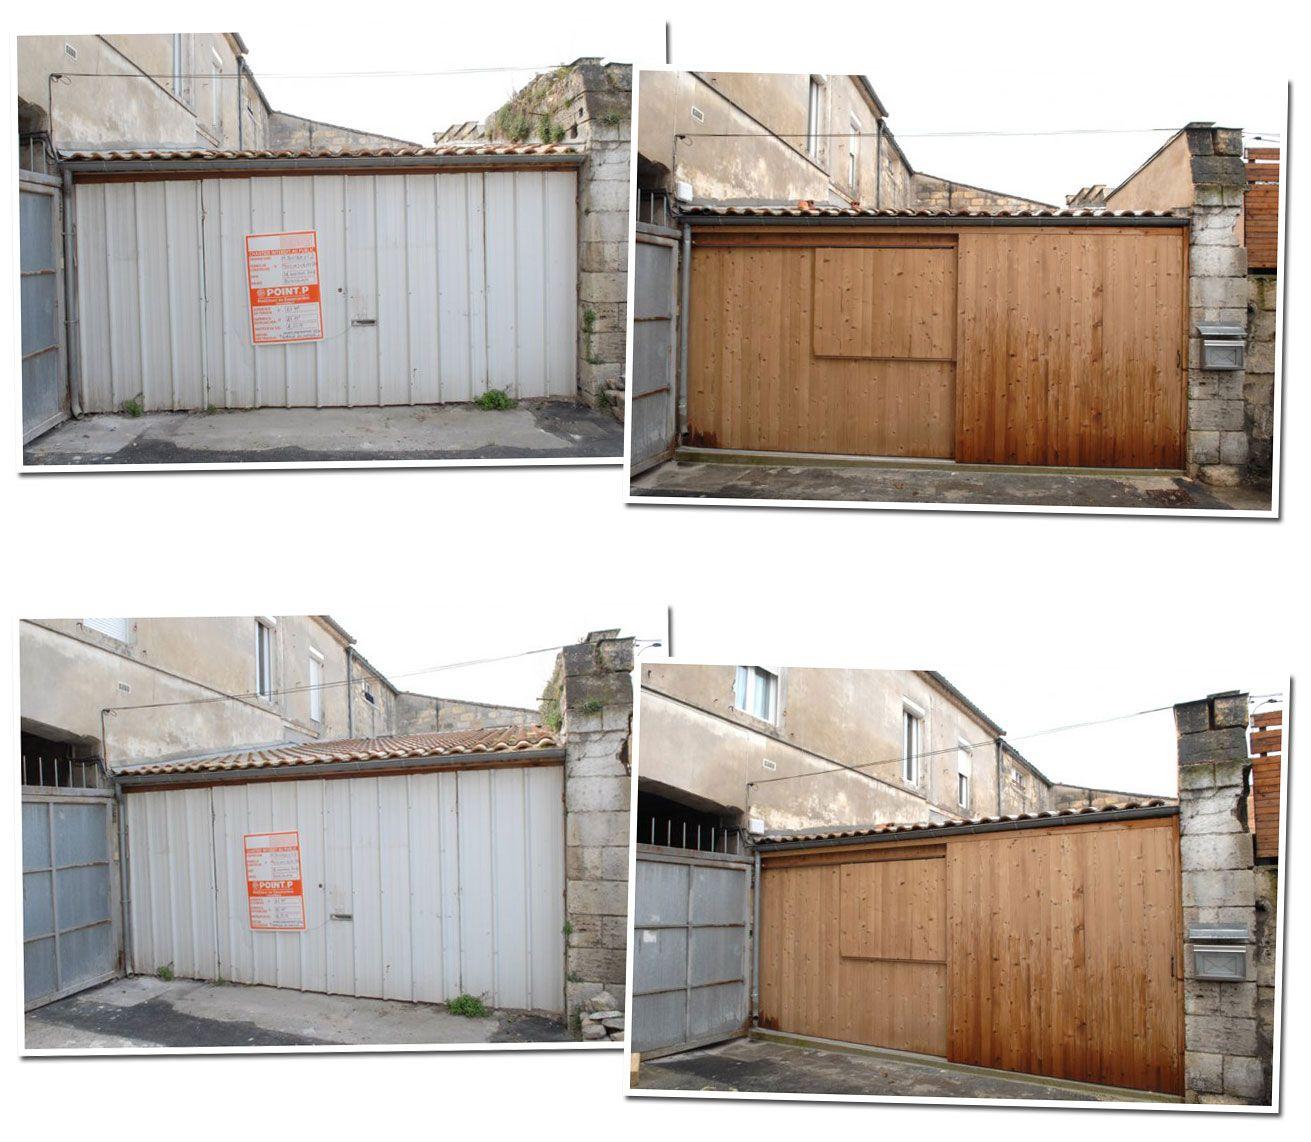 Garage Conversion In Bordeaux By Fabre De Marien Architects House Exterior Converted Garage Garage Garage Doors